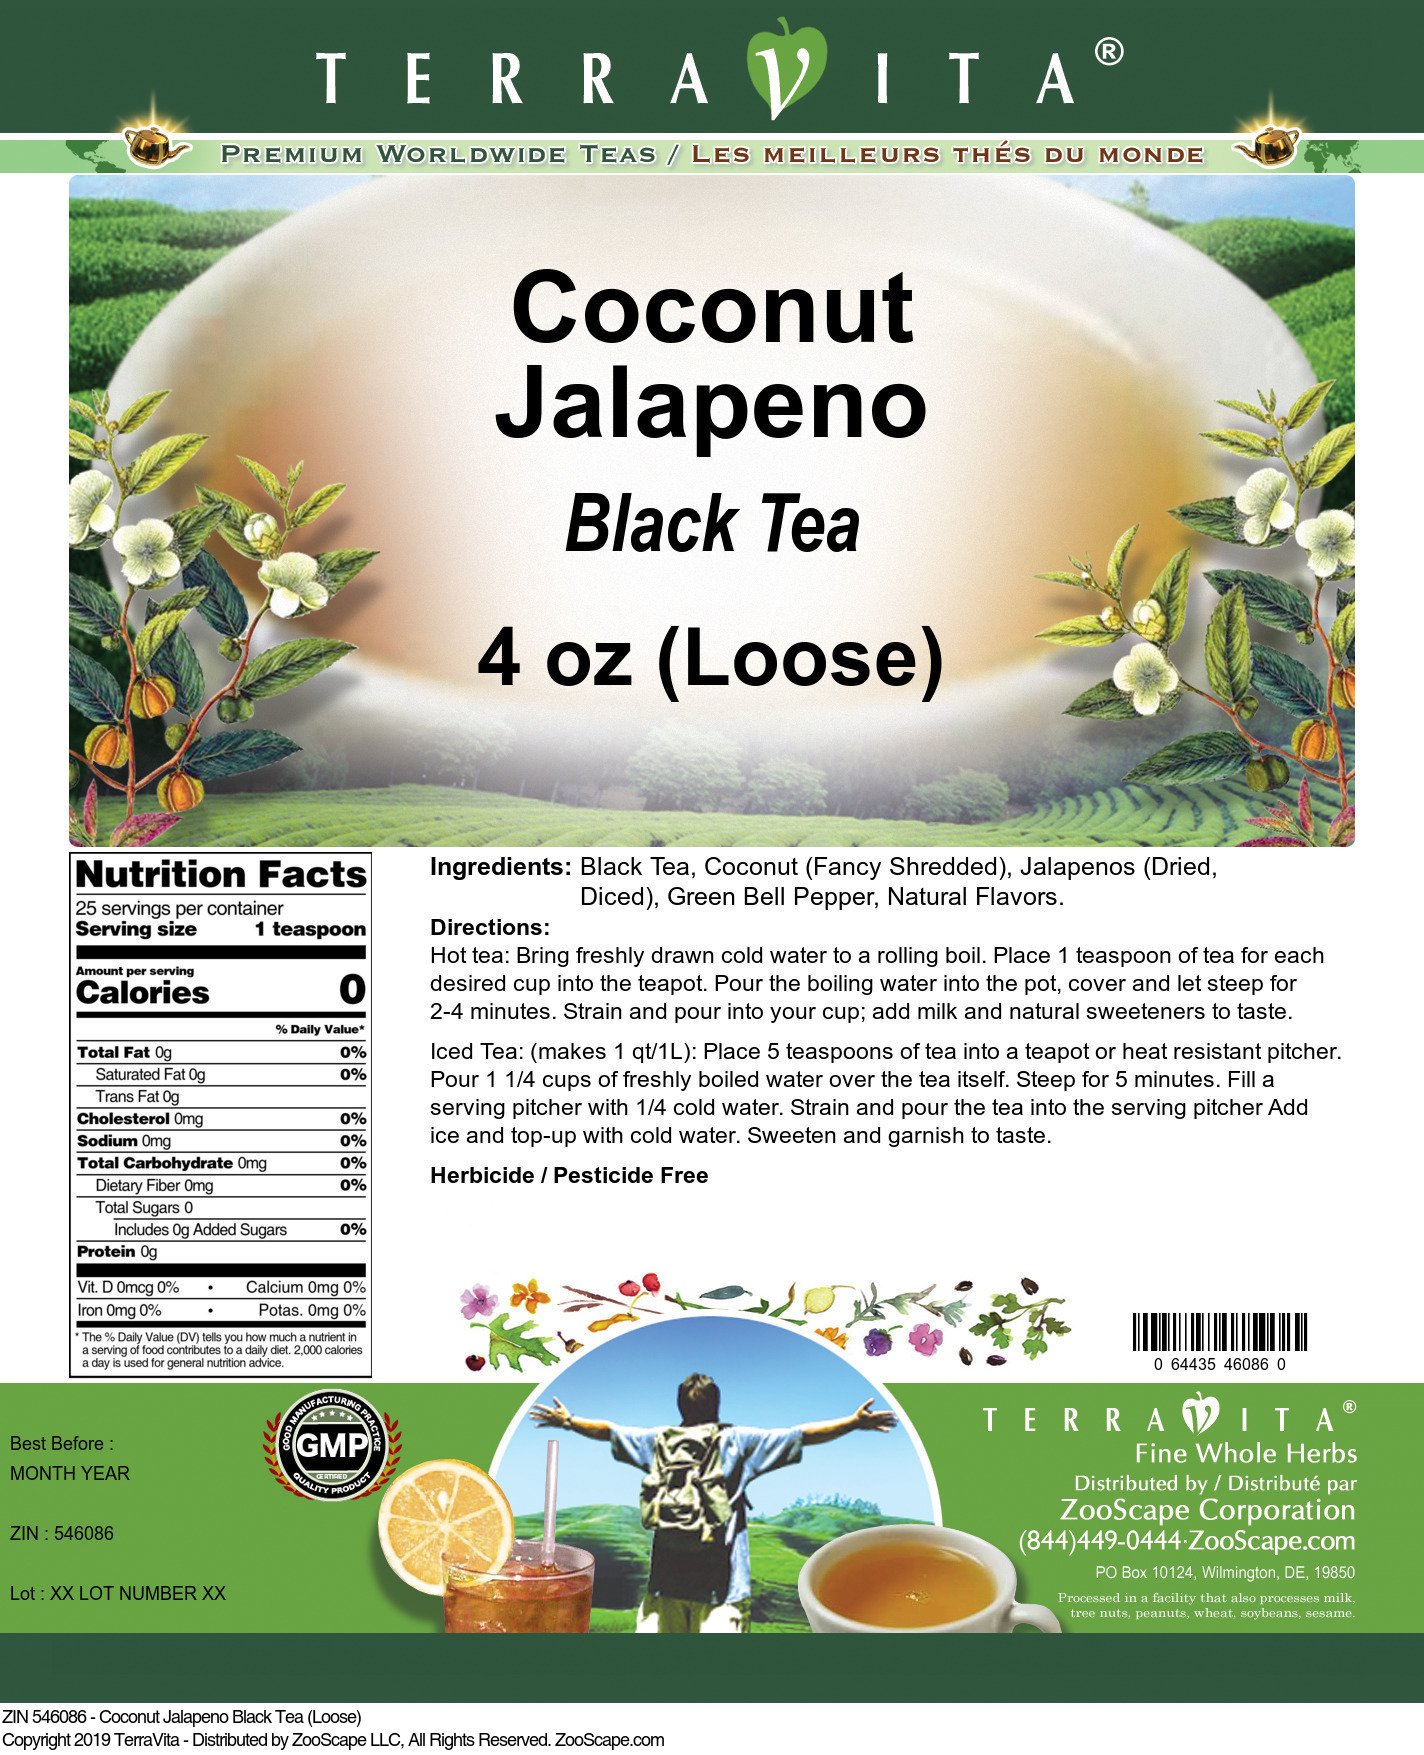 Coconut Jalapeno Black Tea